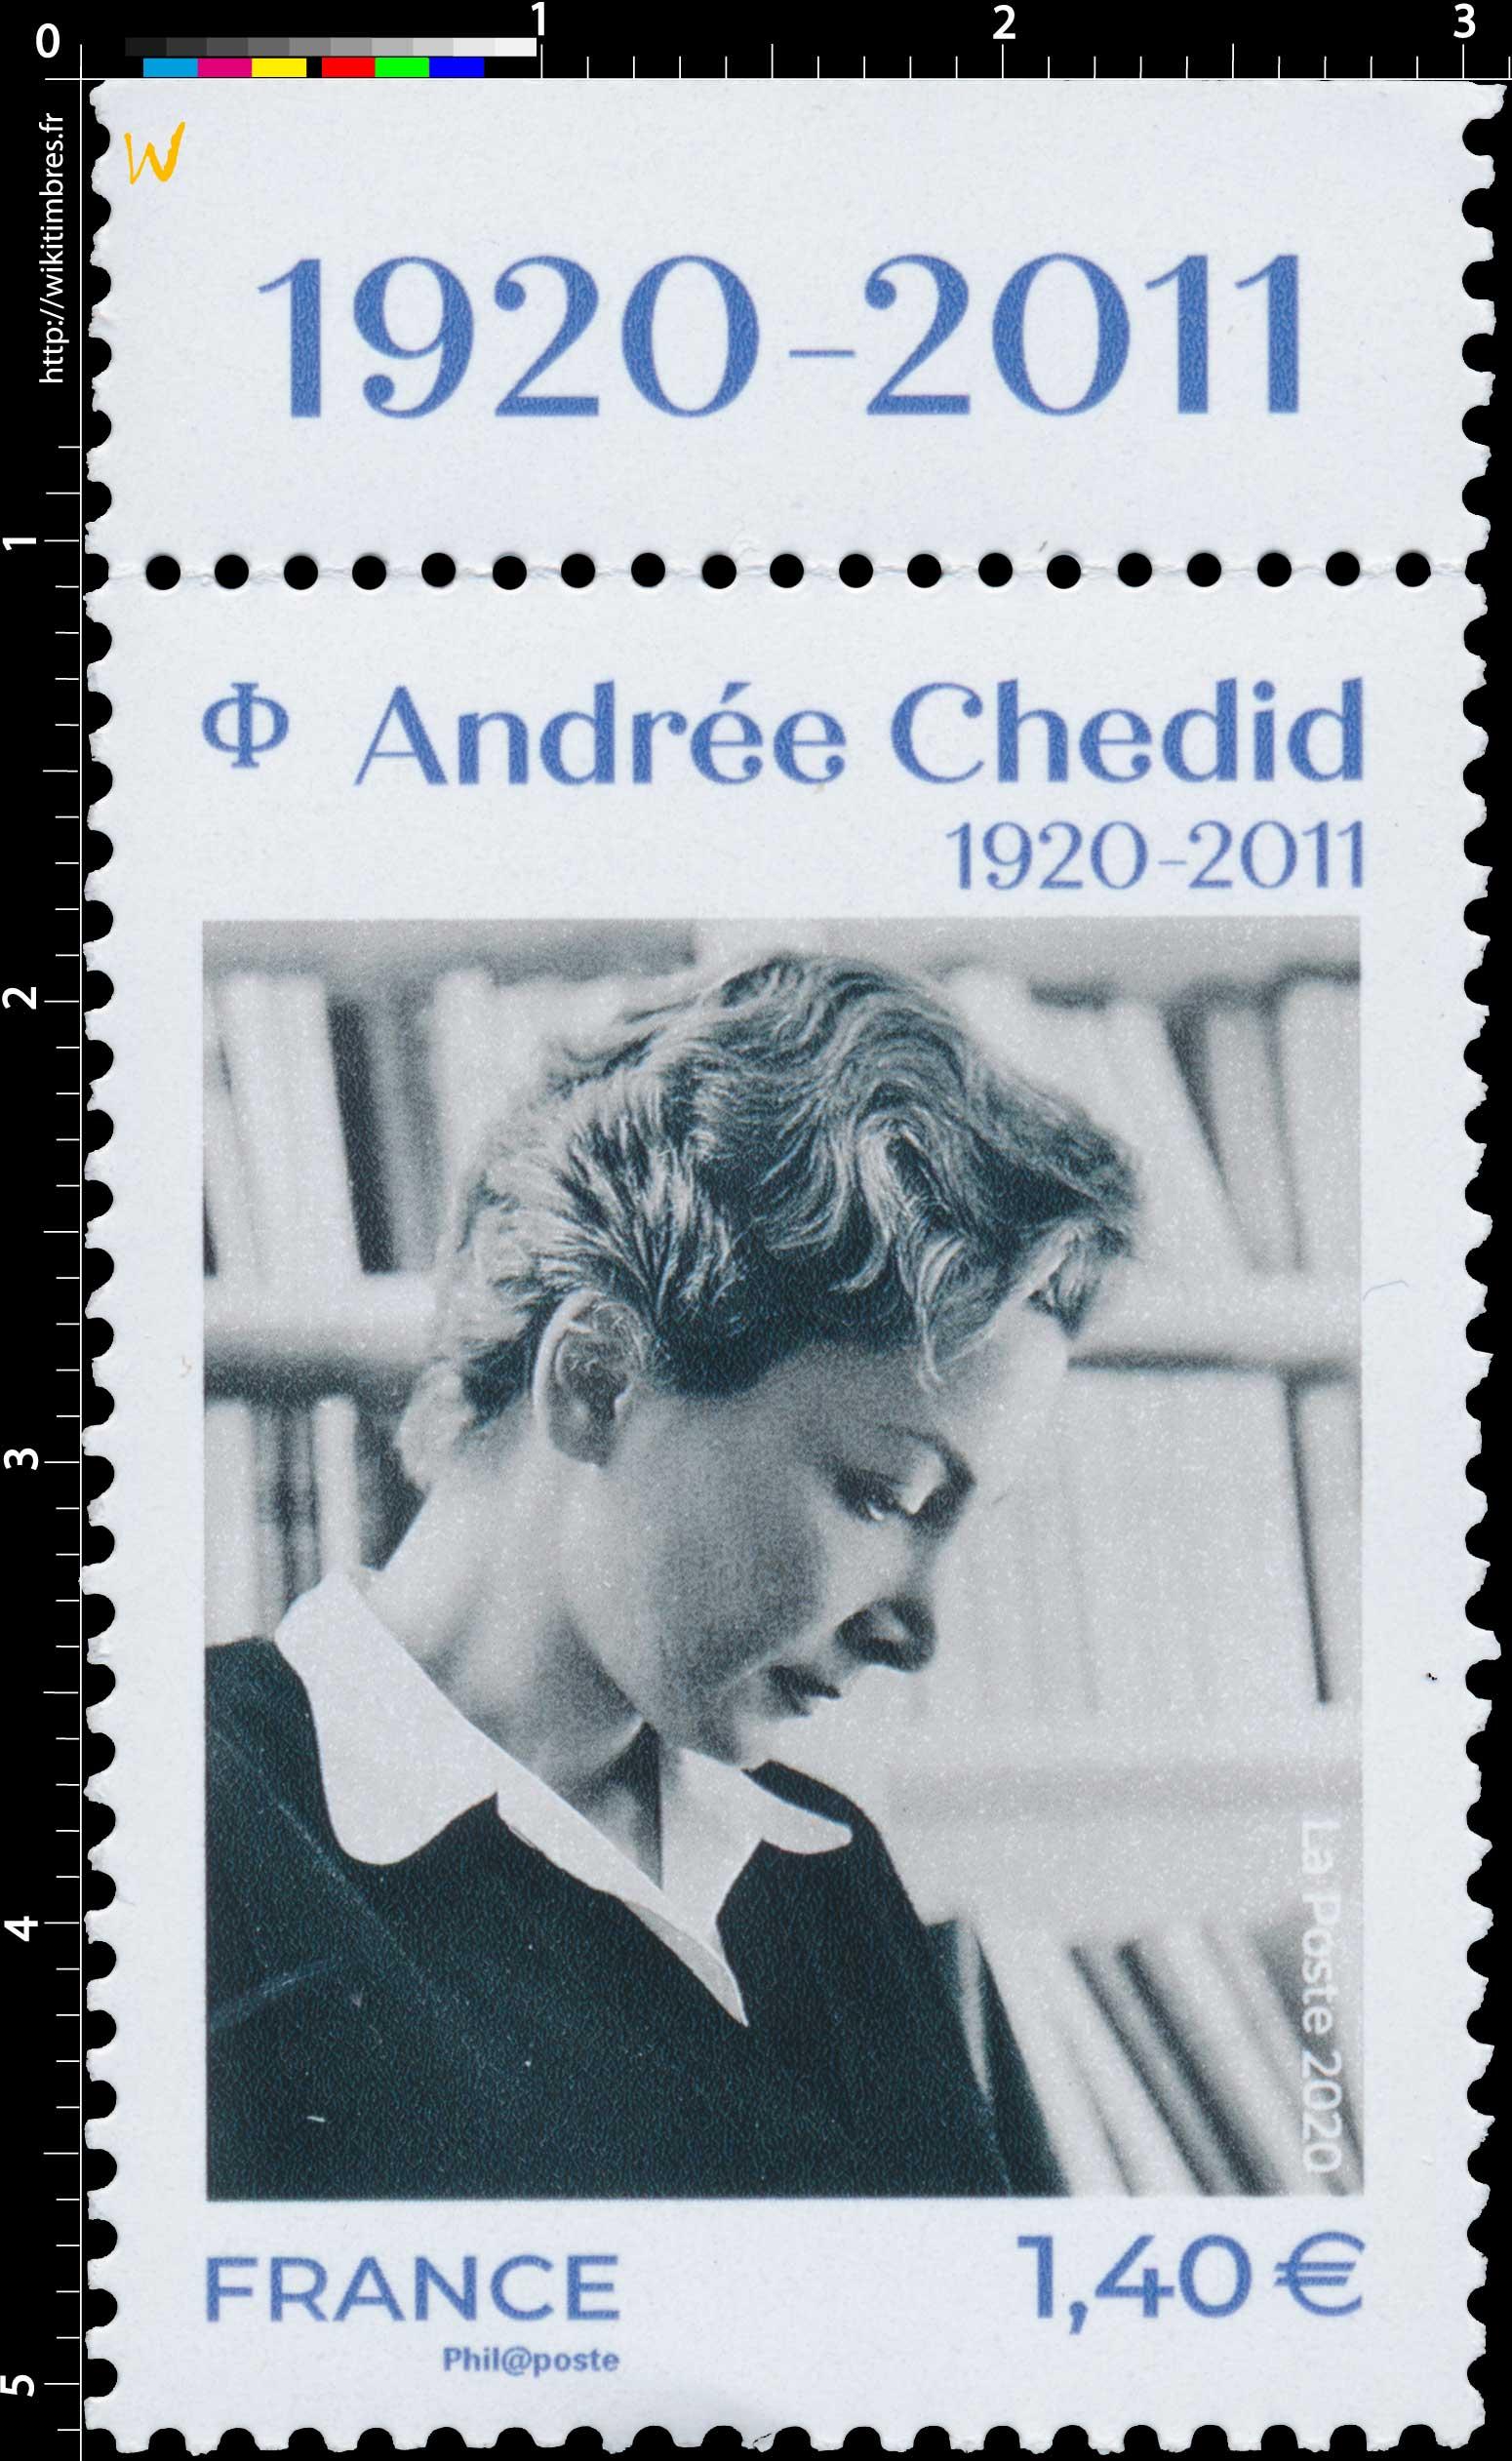 Andrée Chedid 1920 - 2011